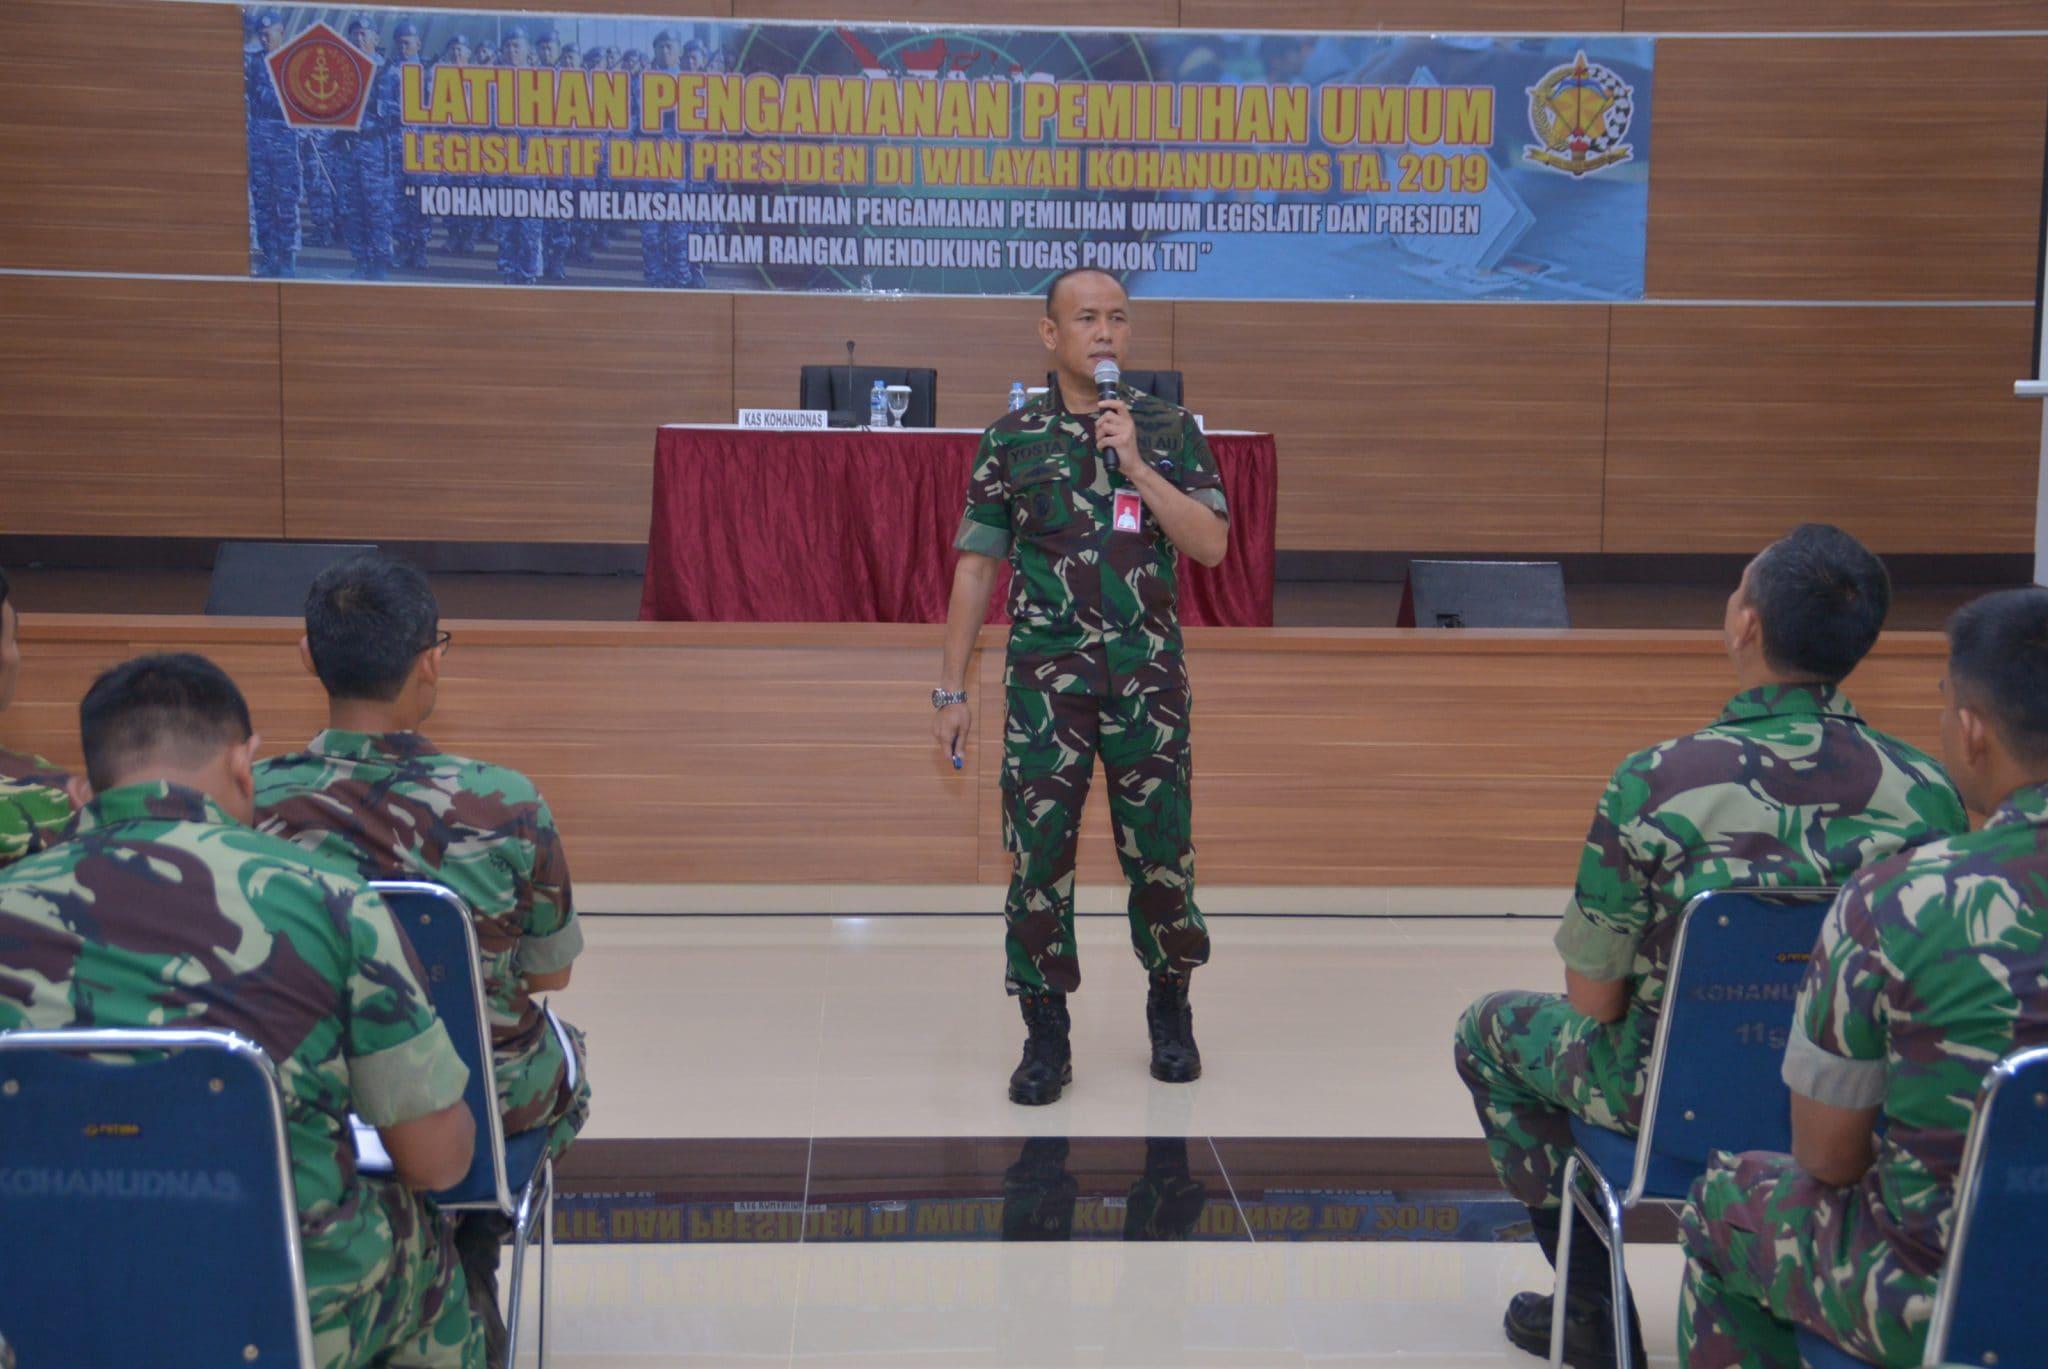 Sosialisasi Netralitas TNI pada Pengamanan Pemilu di Makohanudnas